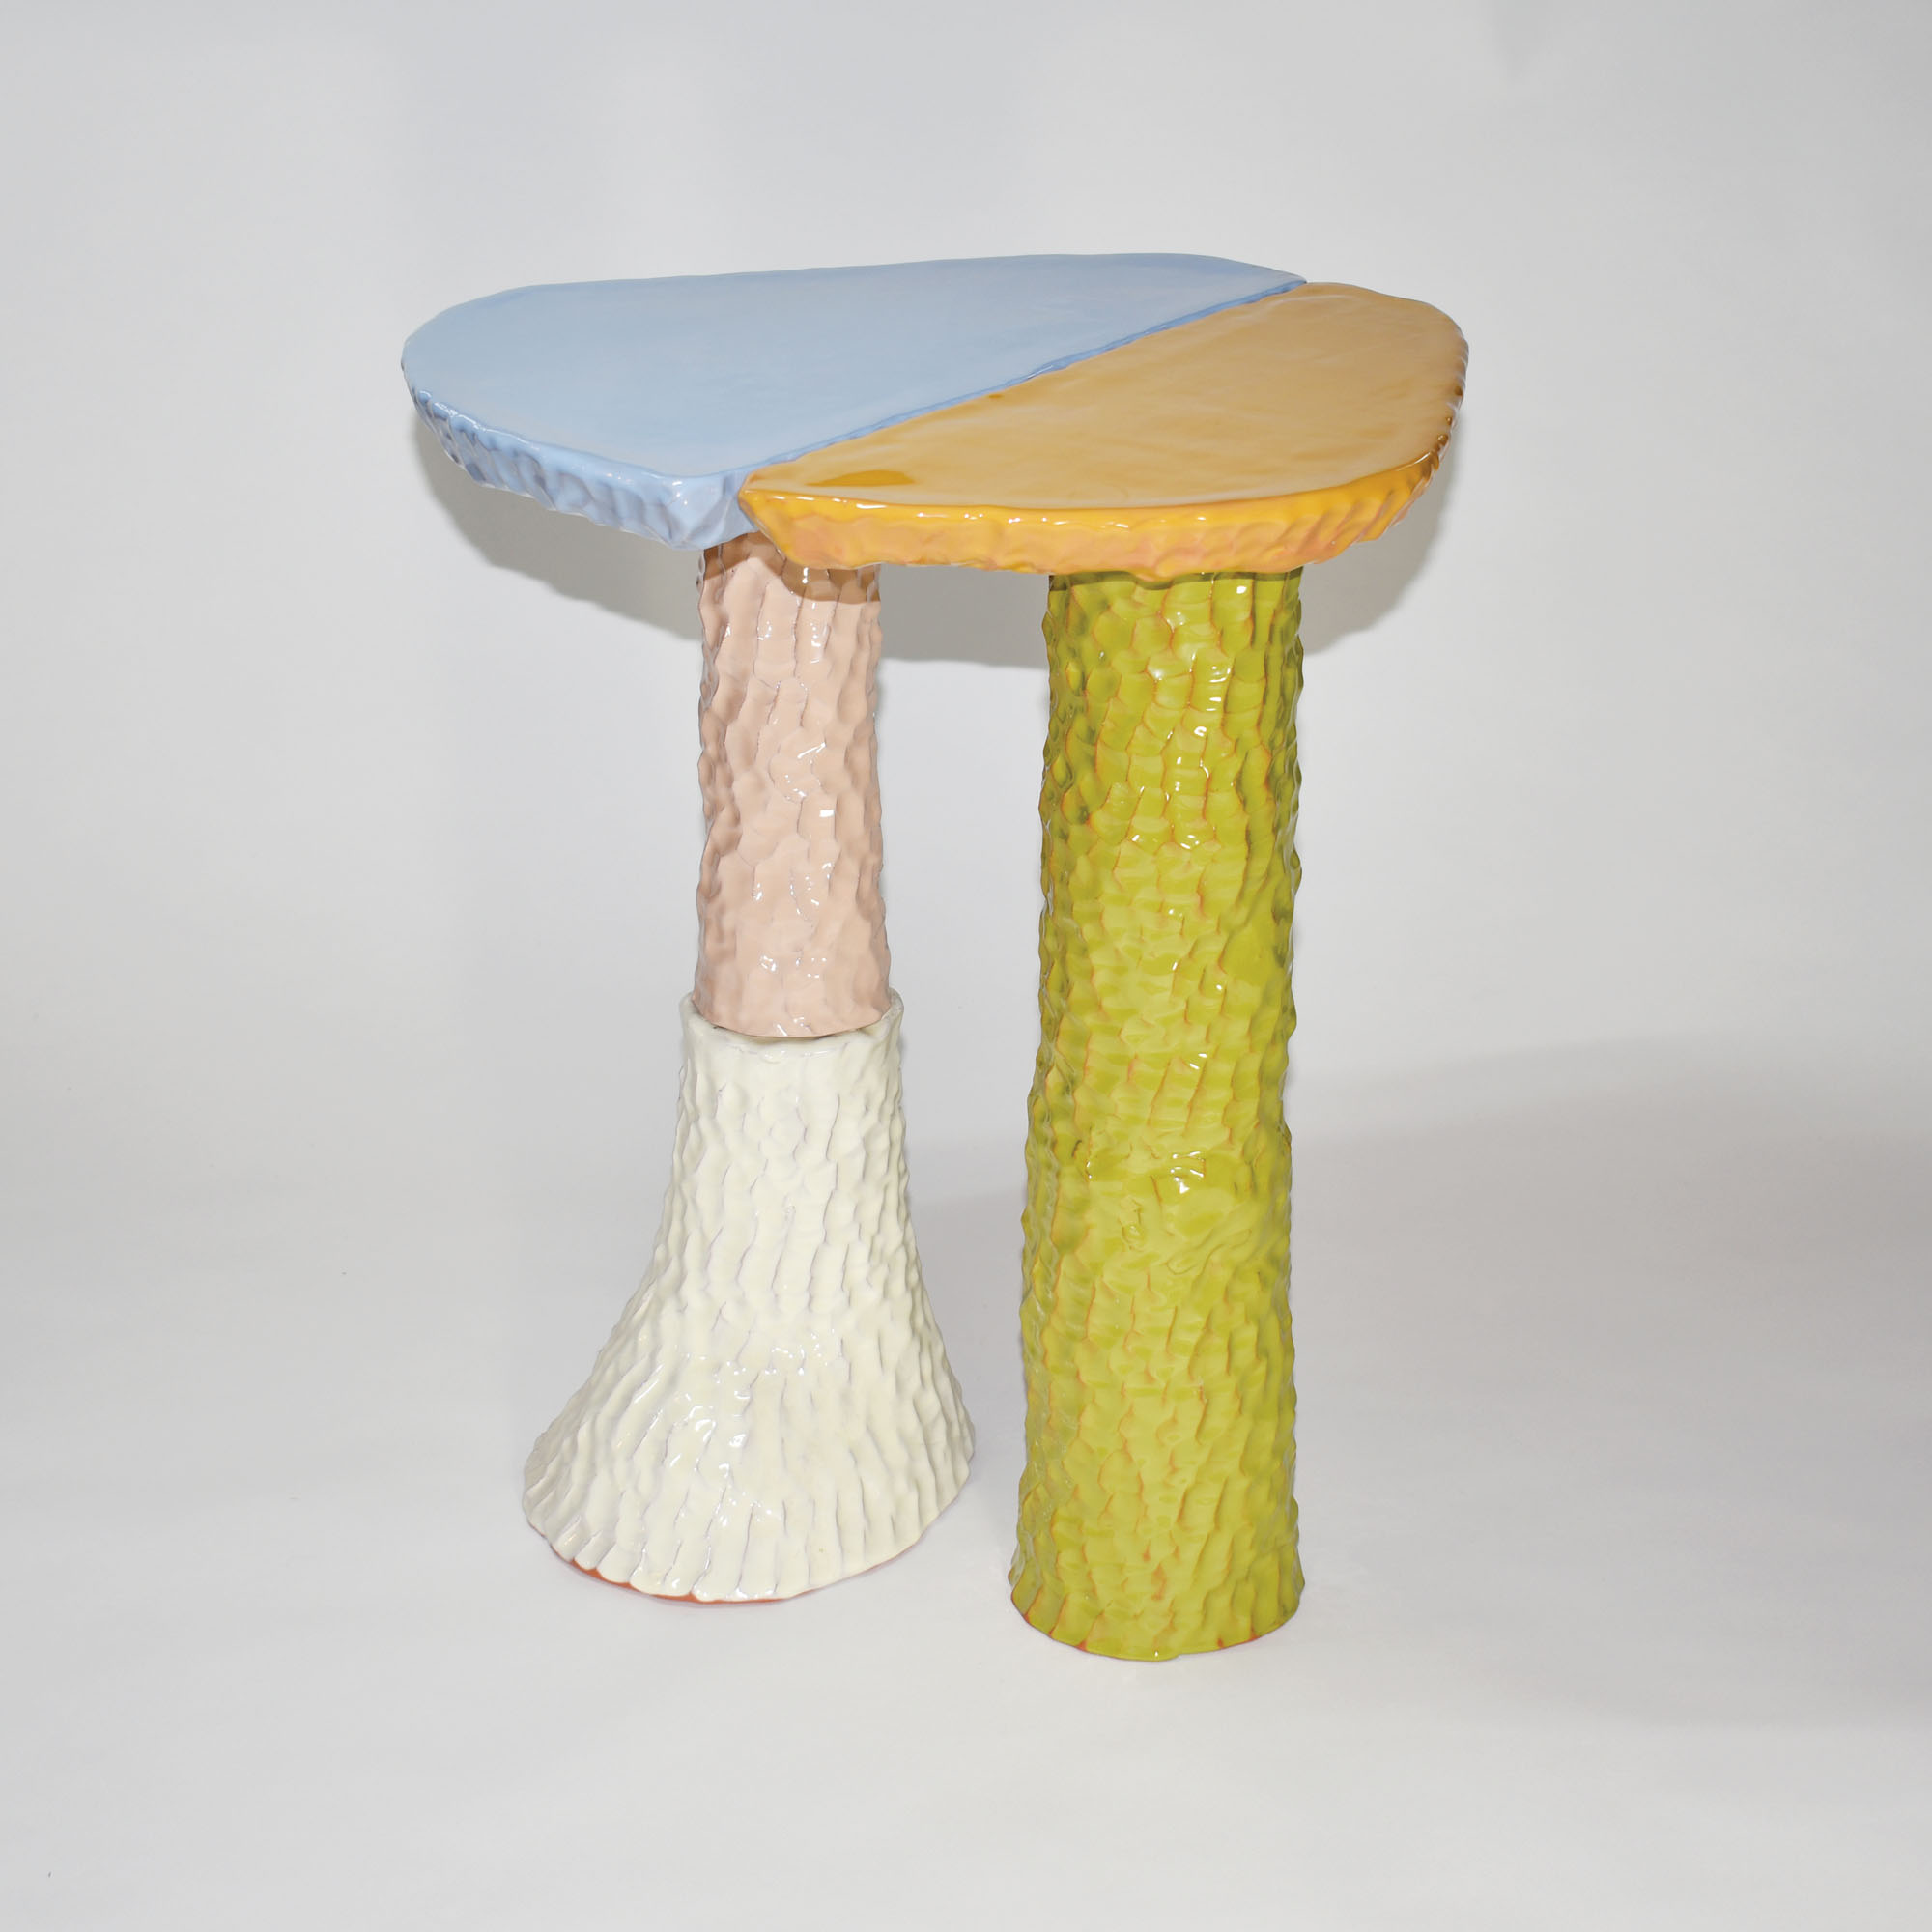 A ceramic table